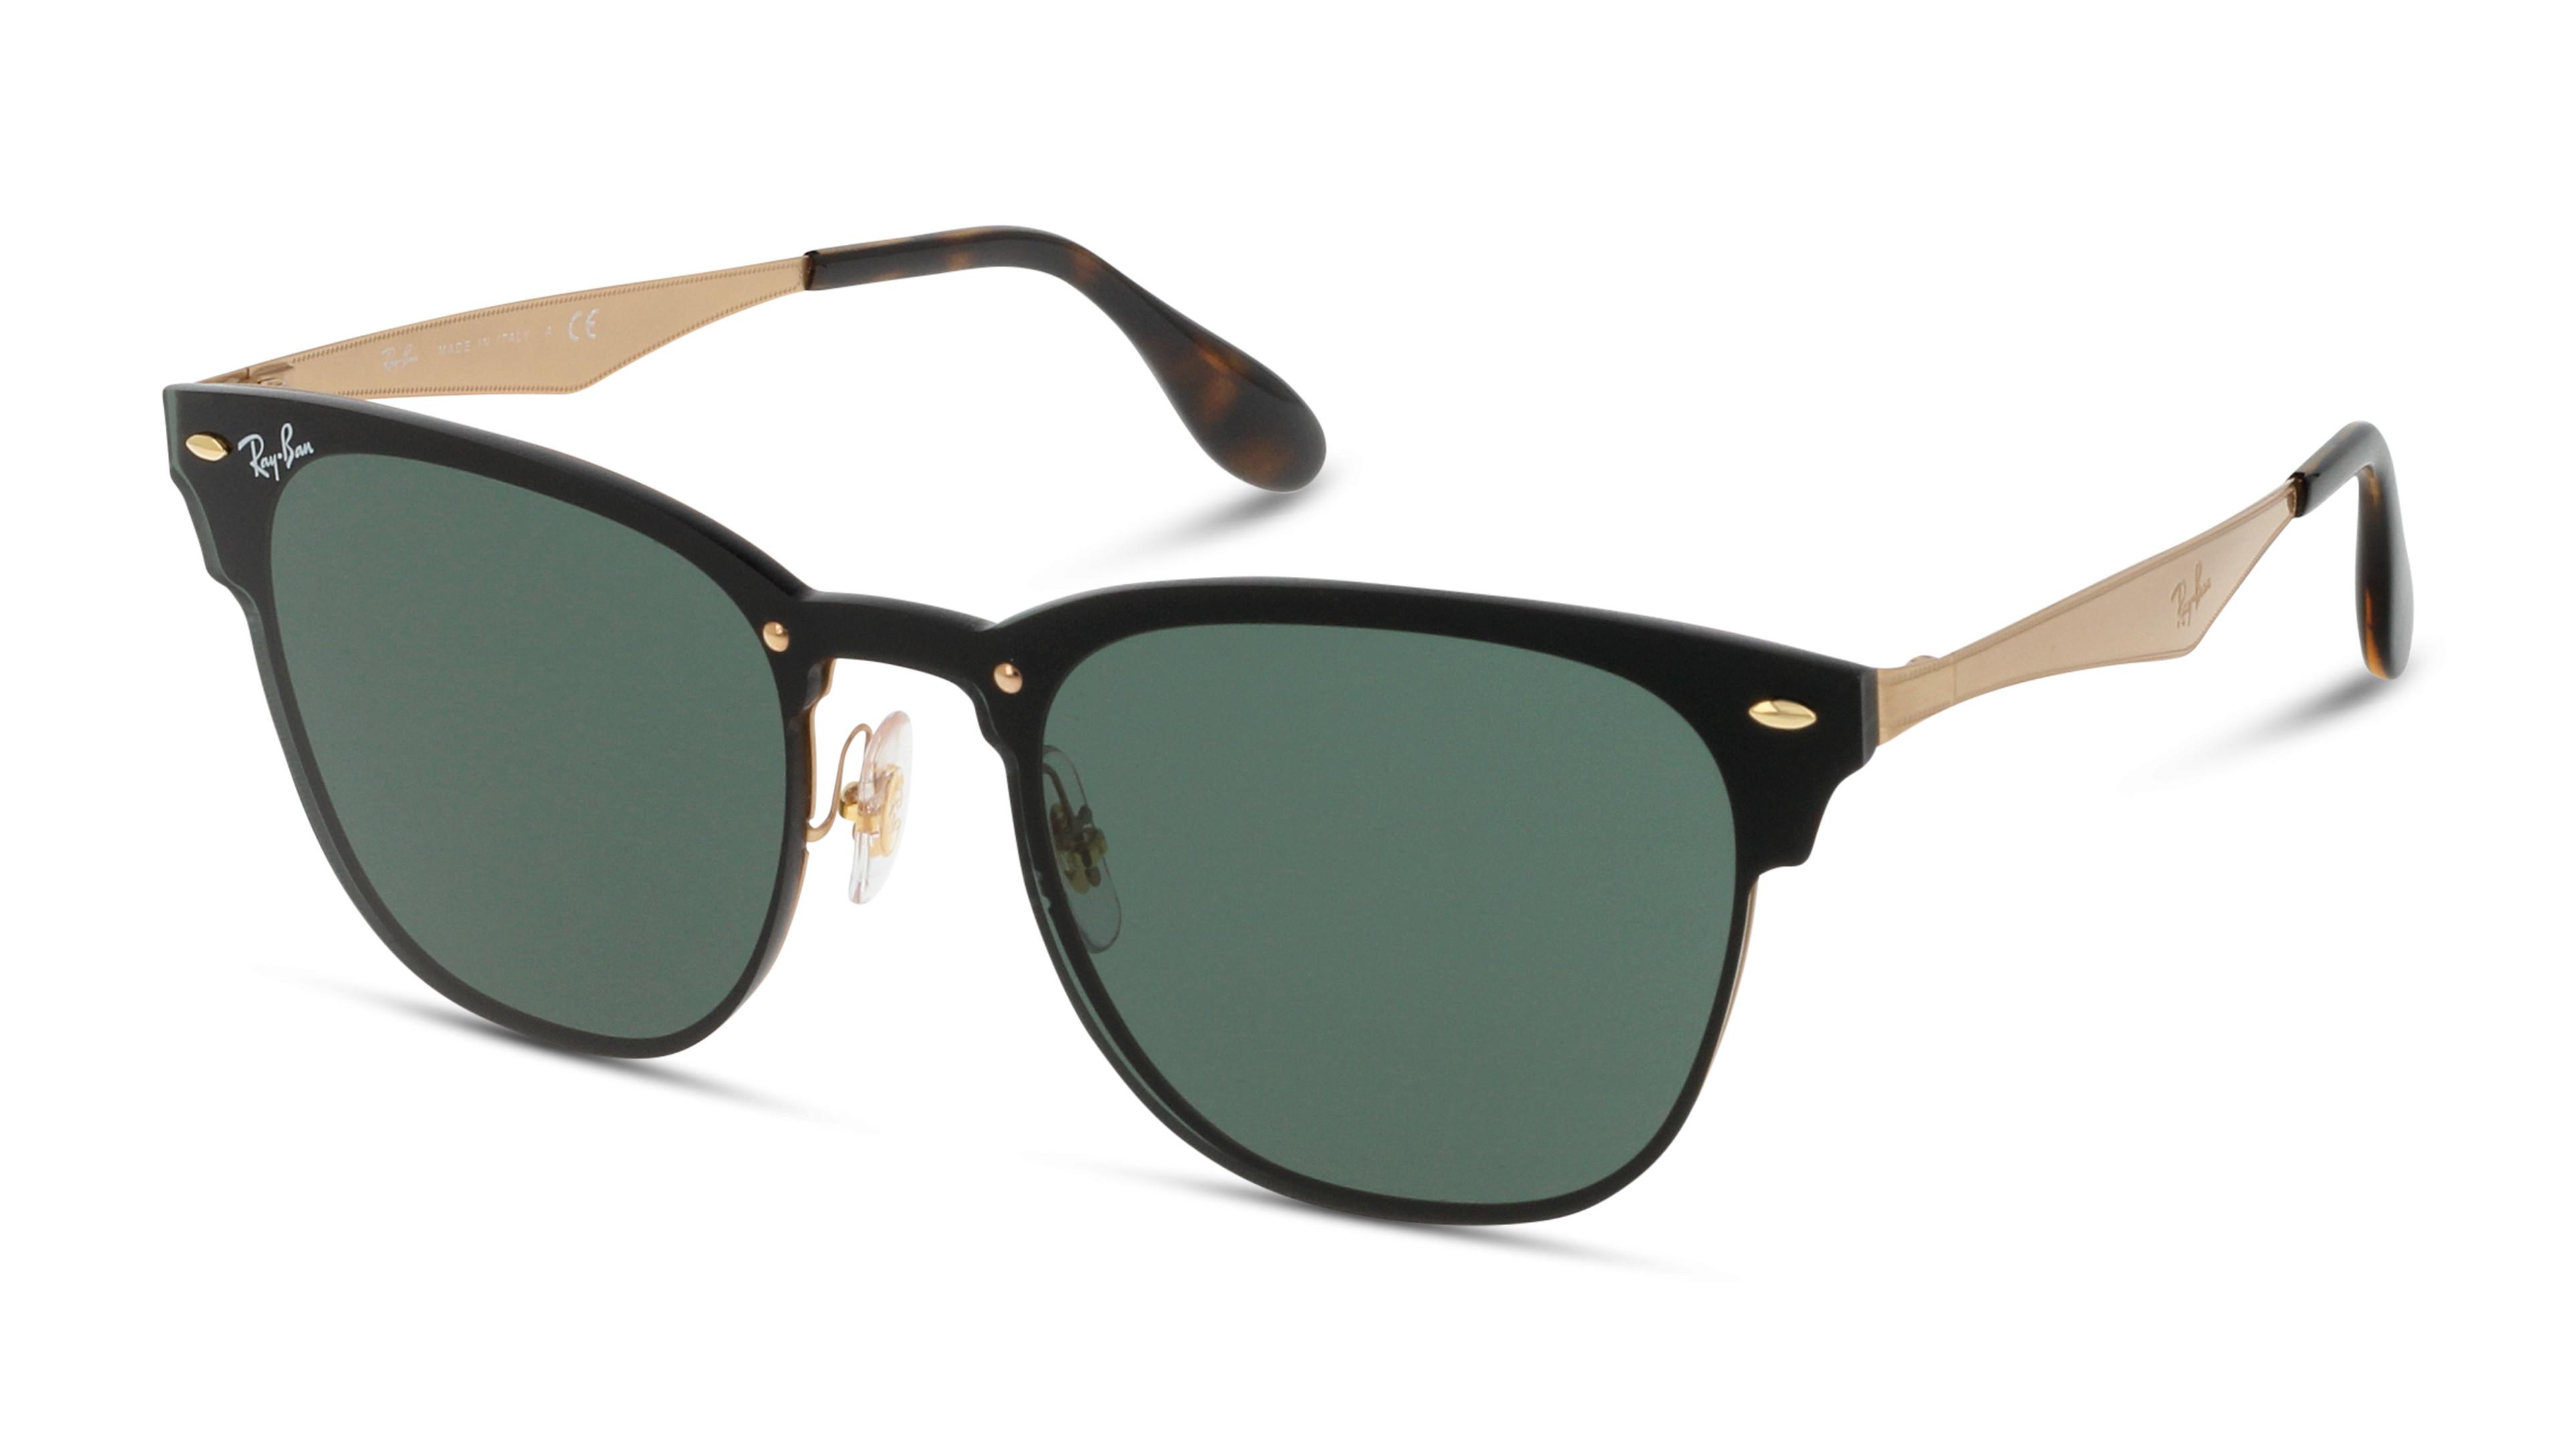 8053672763157-angle-01-rayban-glasses-eyewear-pair